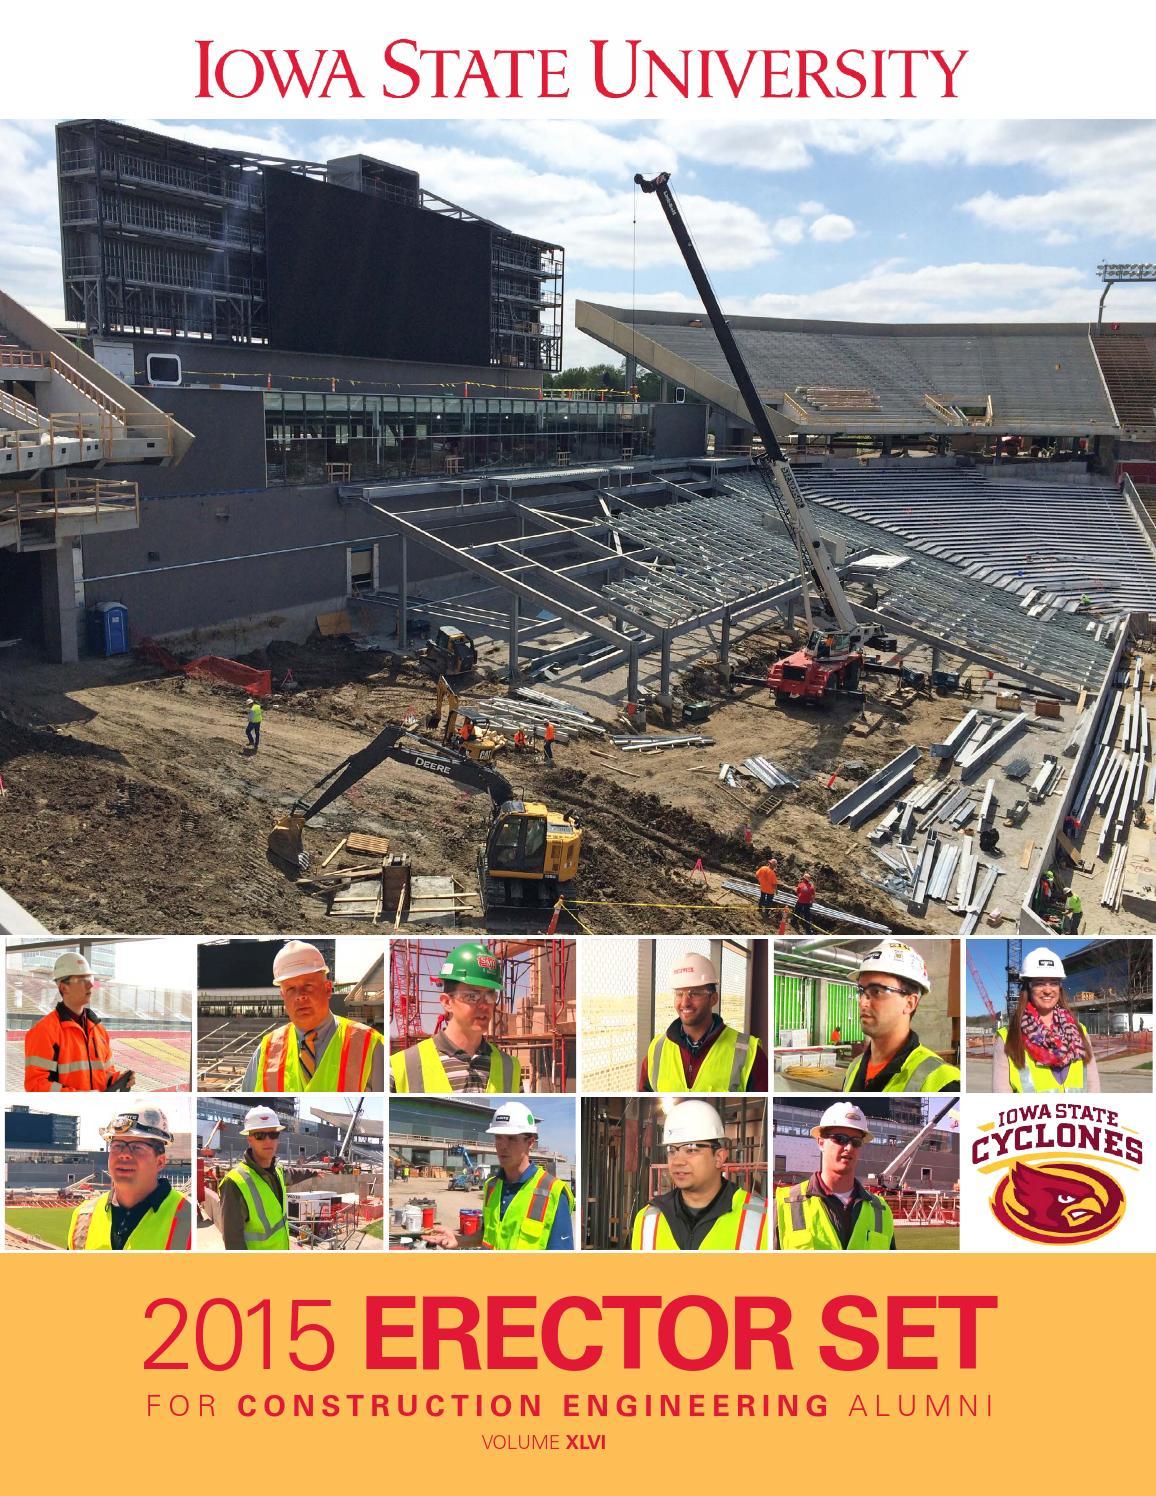 2015 Iowa State University Construction Engineering Erector